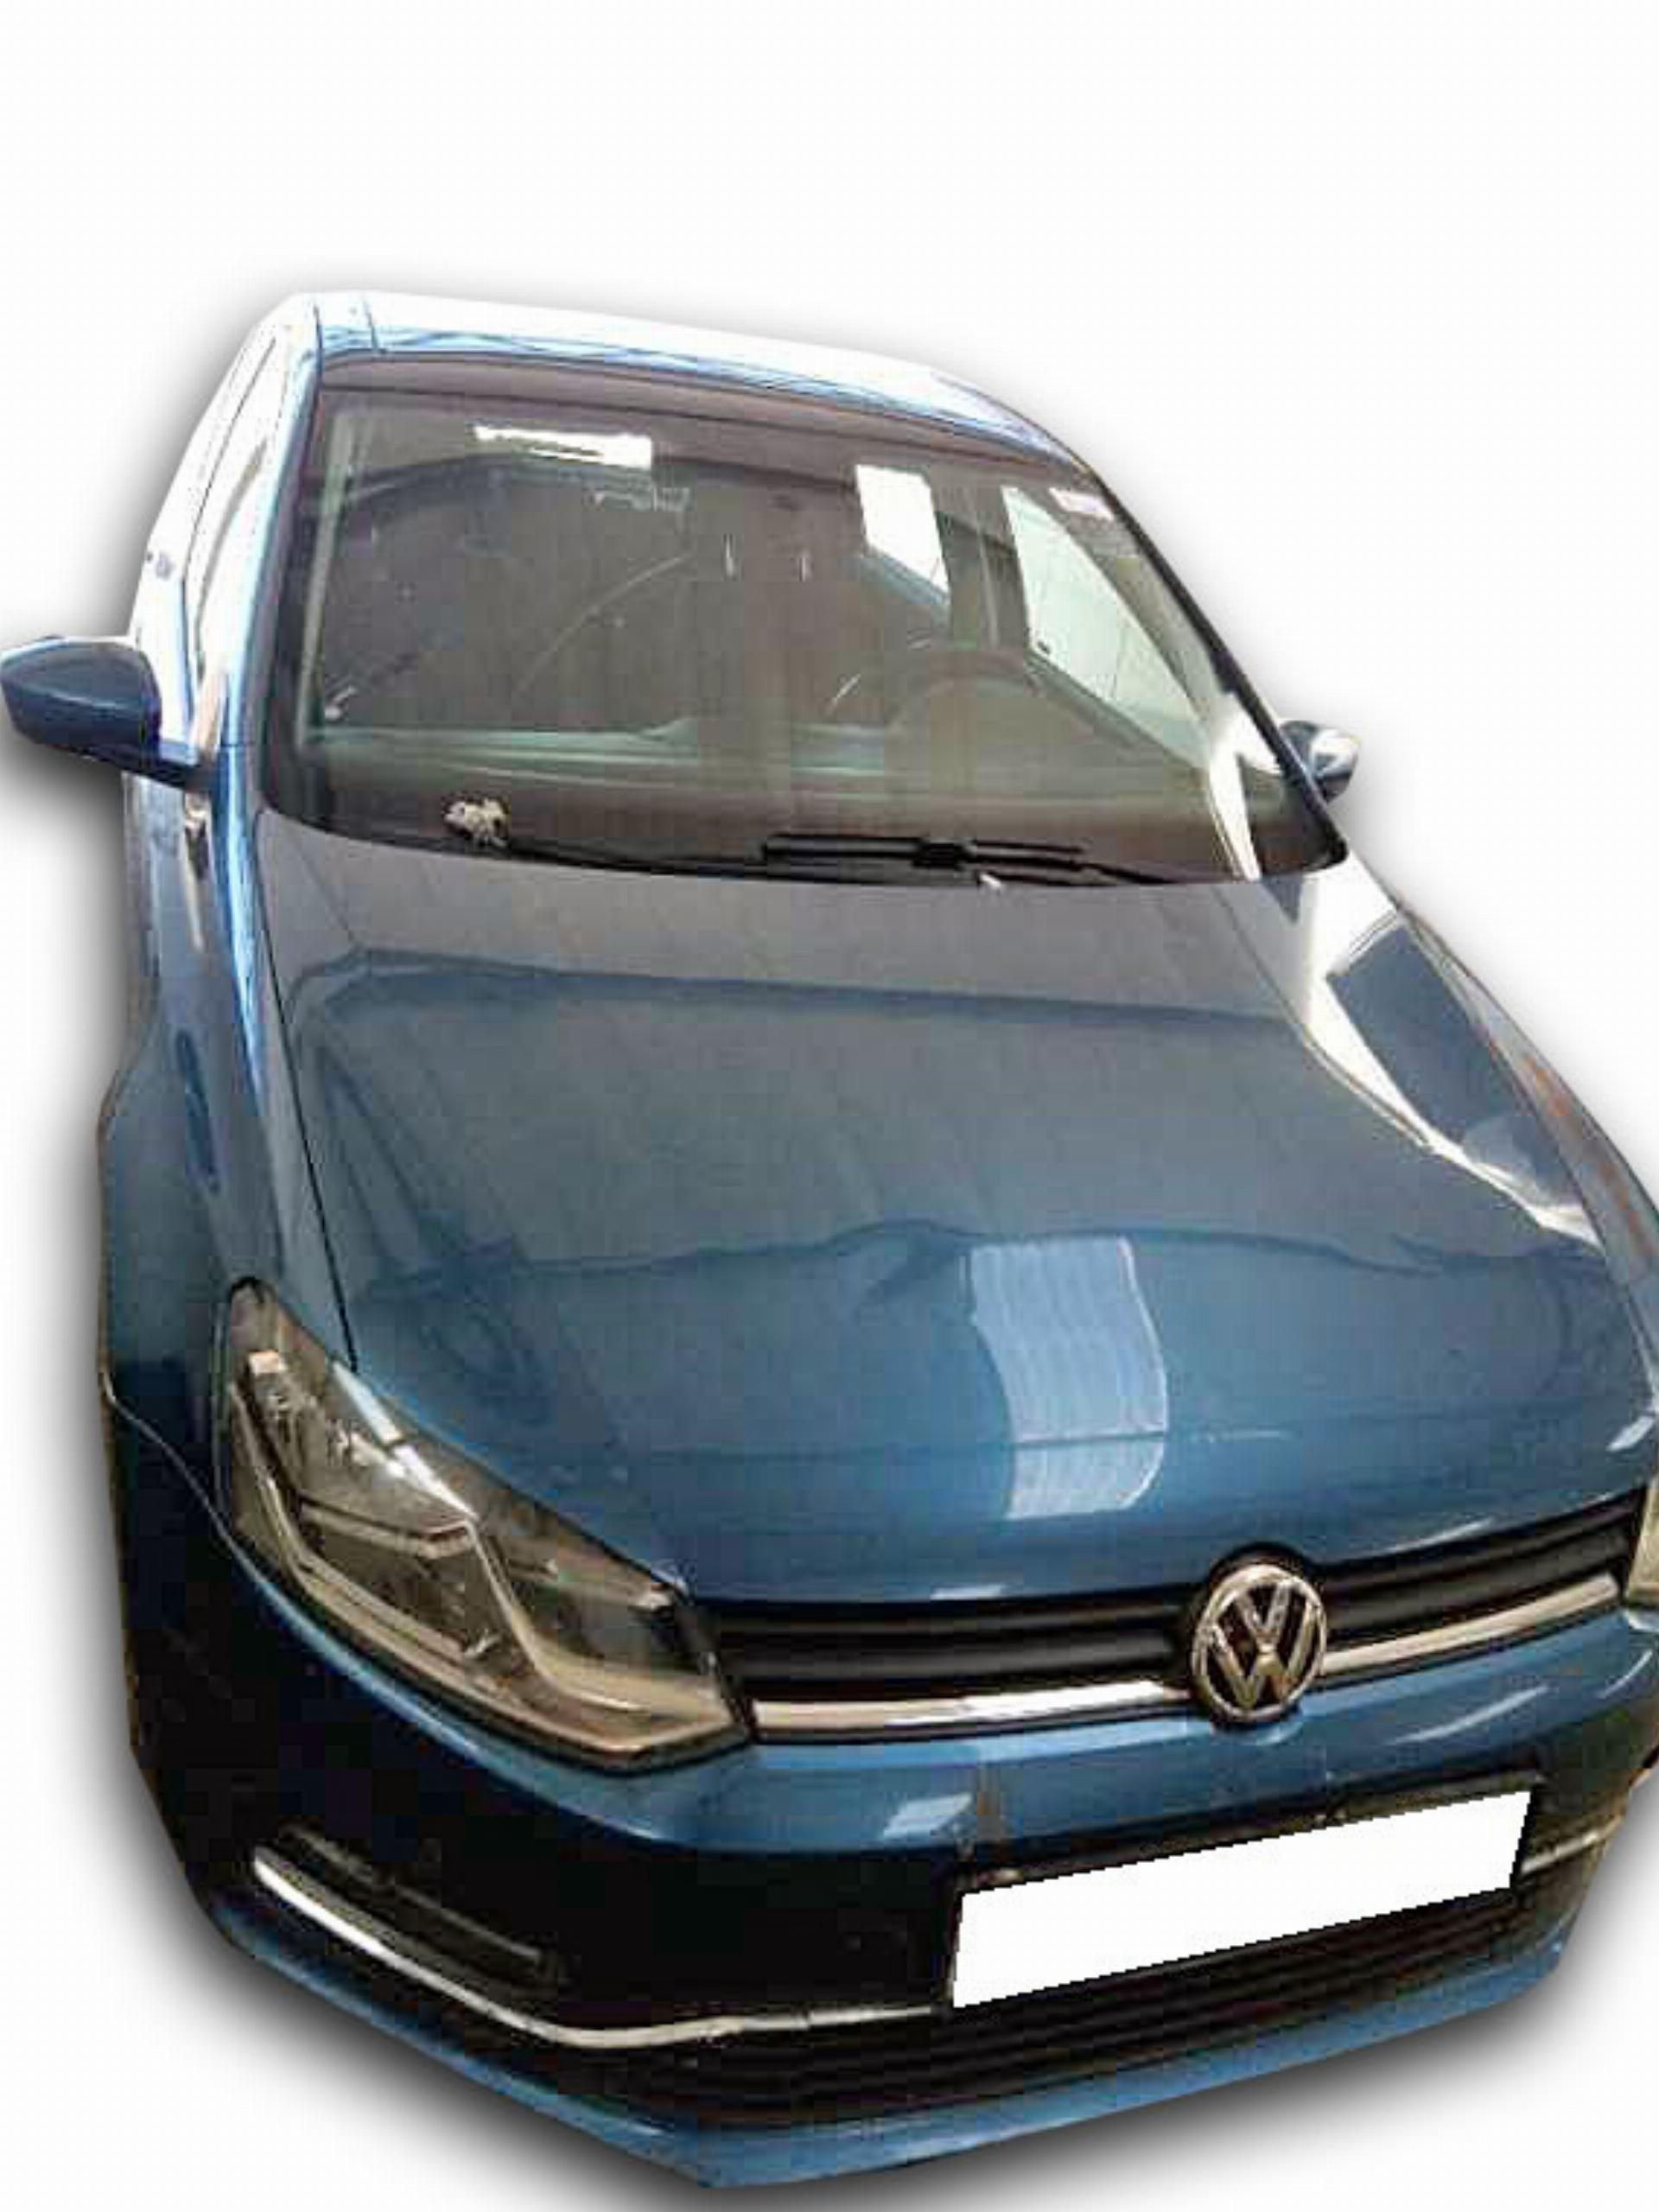 VW 1.2 Tsi Volkswagen Polo GP